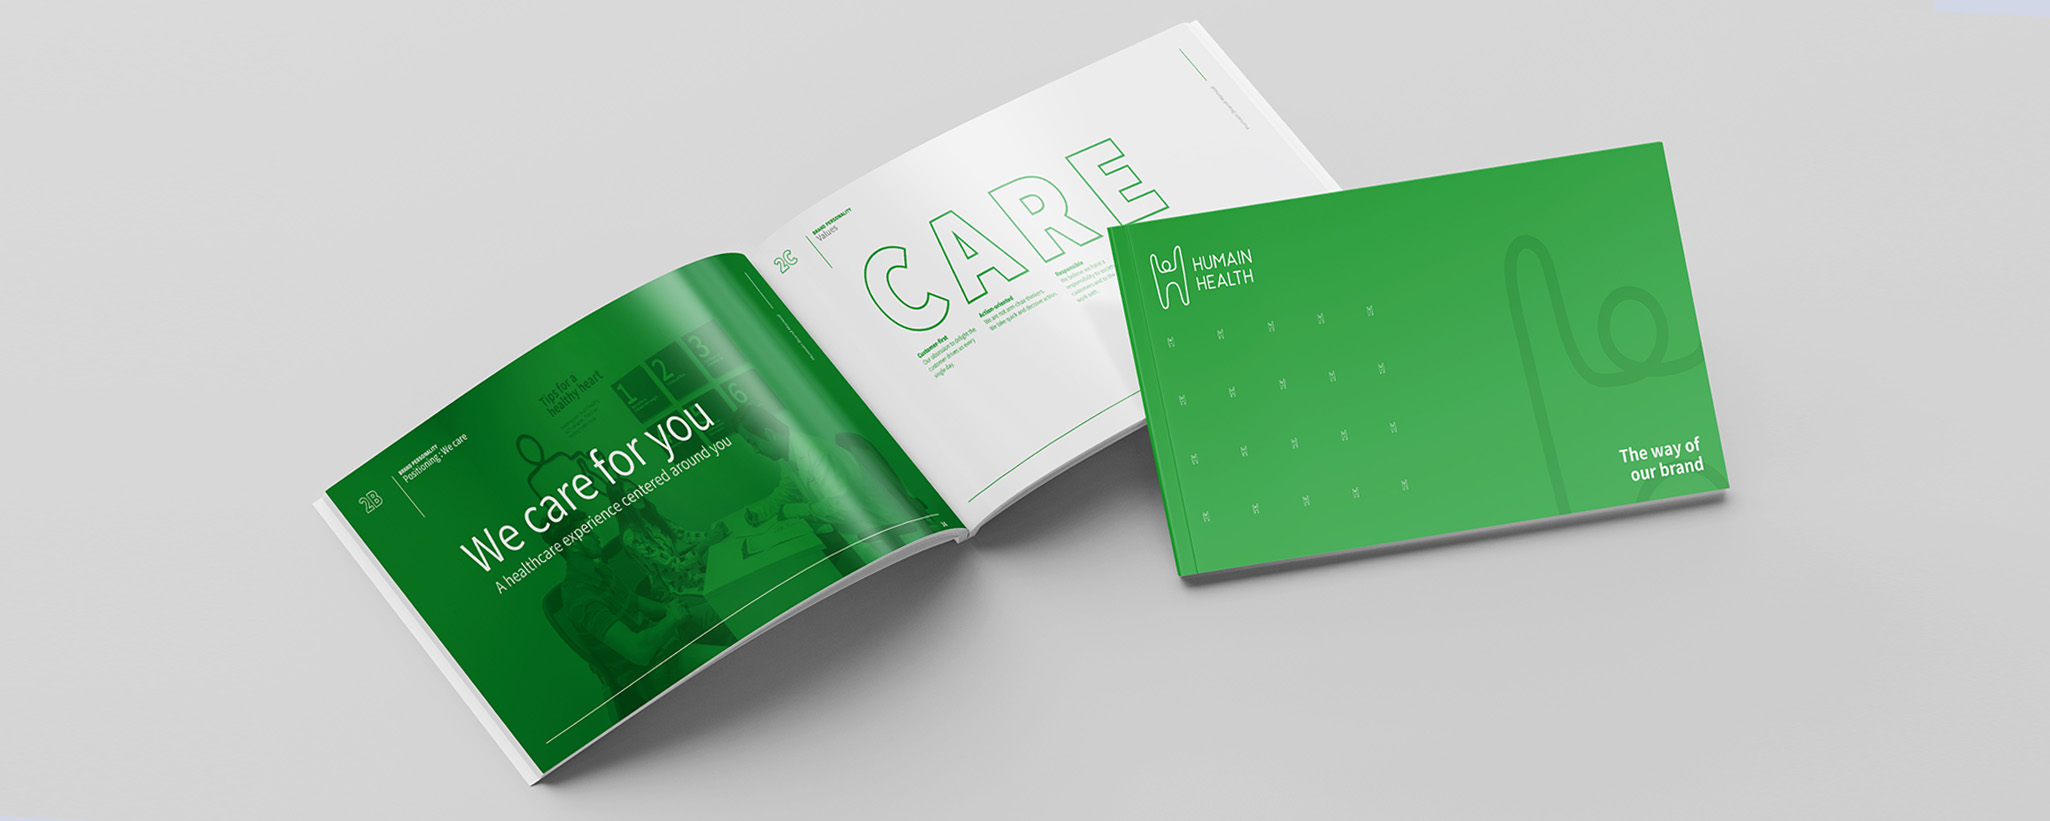 Healthcare Humain Health Rezonant Design Intro 01 1